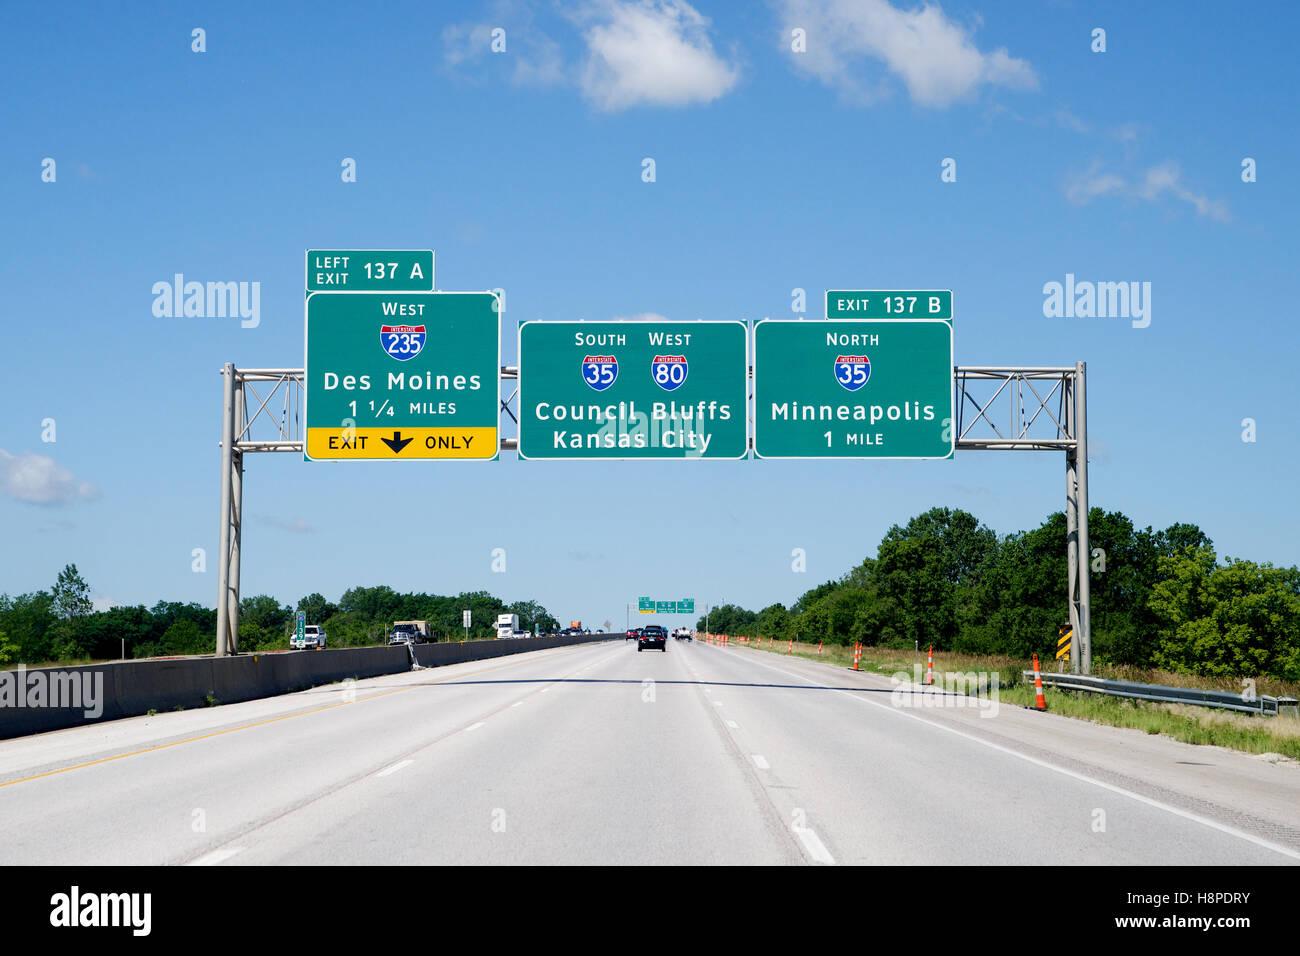 Highway Sign on Interstate 80 Westbound, Iowa, USA Stock Photo